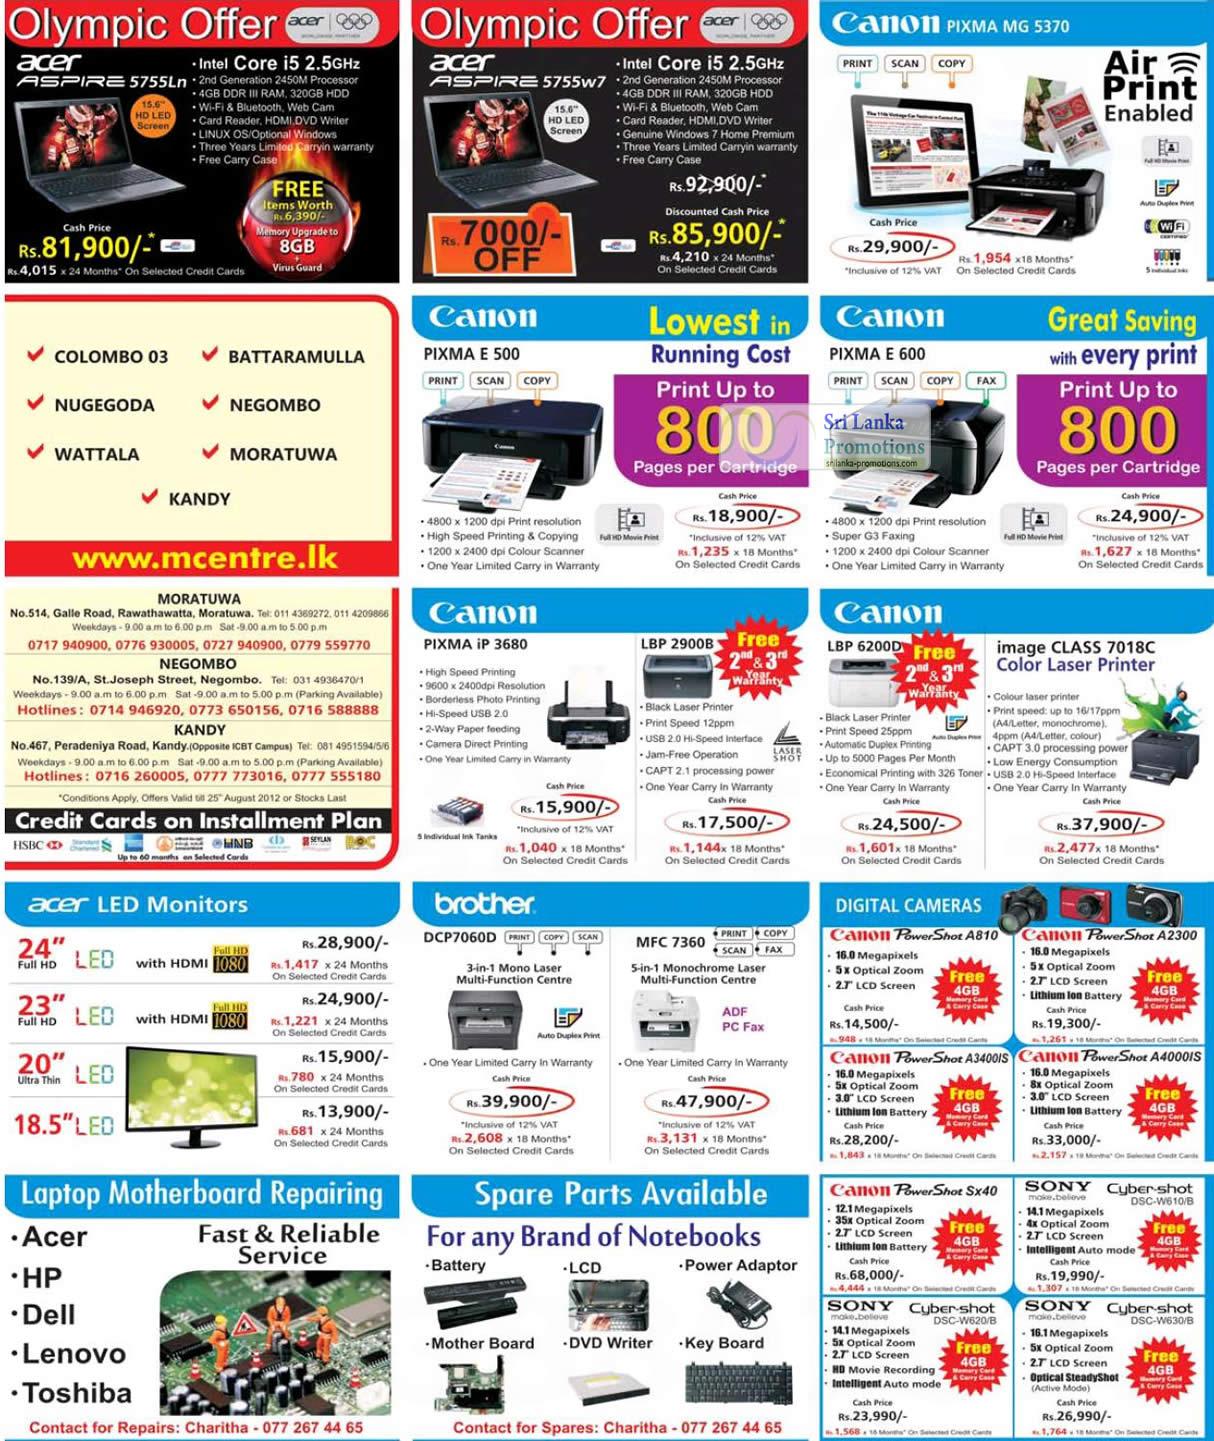 Acer Aspire 5755Ln Notebook, Acer Aspire 5755w7 Notebook, Canon PIXMA E500 Printer, Canon PIXMA MG5370 Printer, Canon PIXMA E600 Printer, Canon LBP 6200D Laser Printer, Canon PIXMA iP 3680 Printer, Canon ImageCLASS 7018C Laser Printer, Brother DCP-7060D Laser Printer, Brother MFC-7360 Laser Printer, Canon PowerShot A810 Digital Camera, Canon Powershow A3400is Digital Camera, Canon PowerShot A2300 Digital Camera, Canon PowerShot A400is Digital Camera, Canon Powershow SX40 Digital Camera, Sony Cybershot DSC-W620 Digital Camera, Sony Cybershot DSC-W630 Digital Camera, Sony Cybershot DSC-W610 Digital Camera